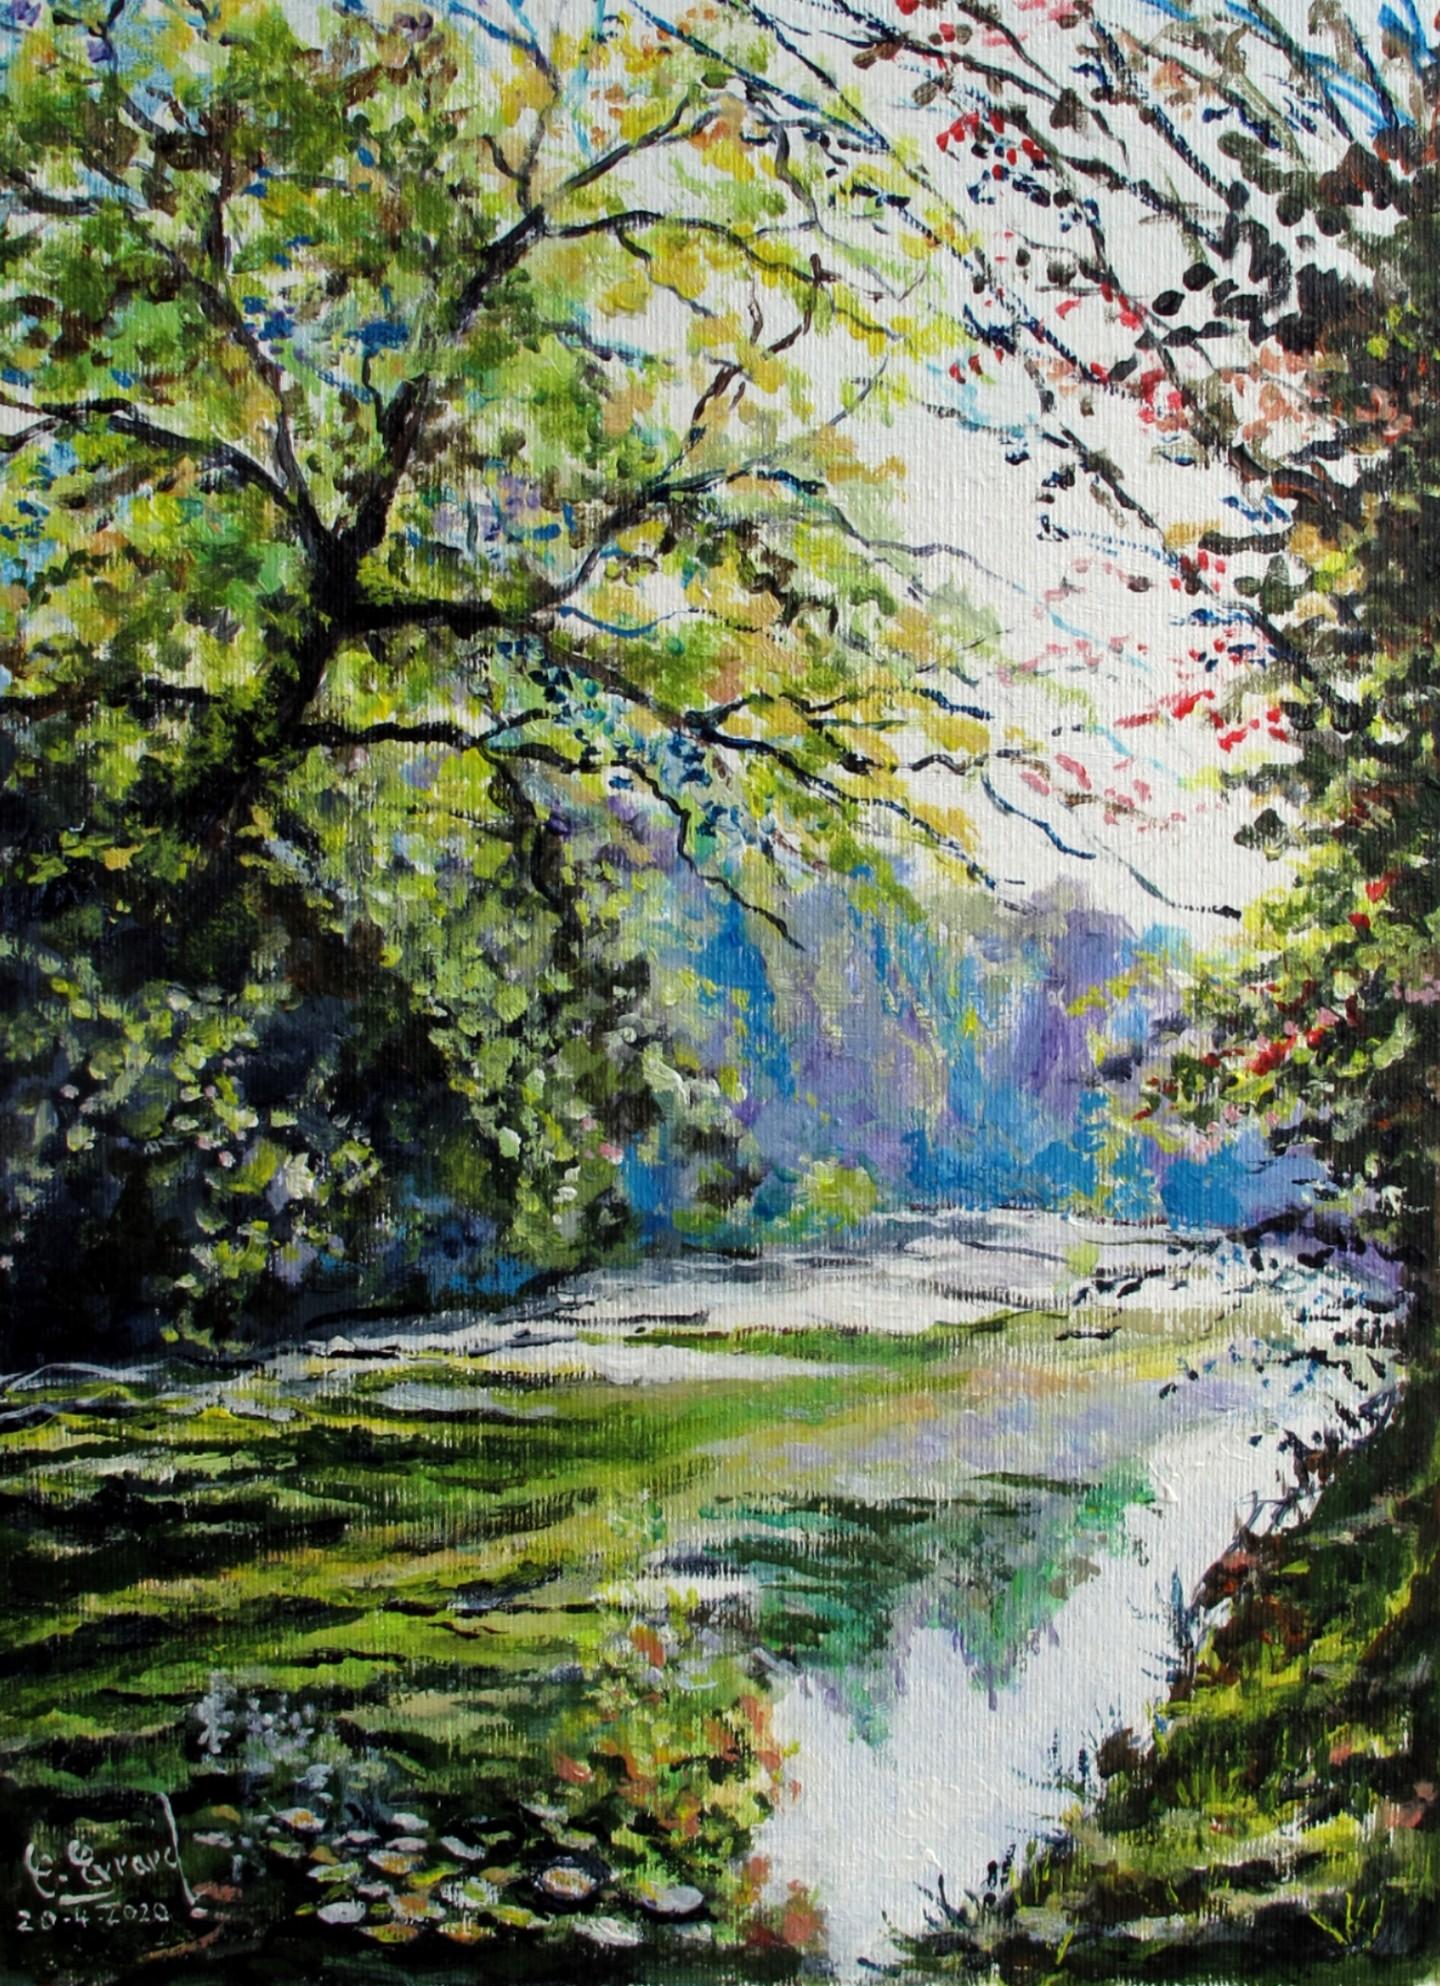 Claude Evrard - Les rives de l'Yerres (Crosne)